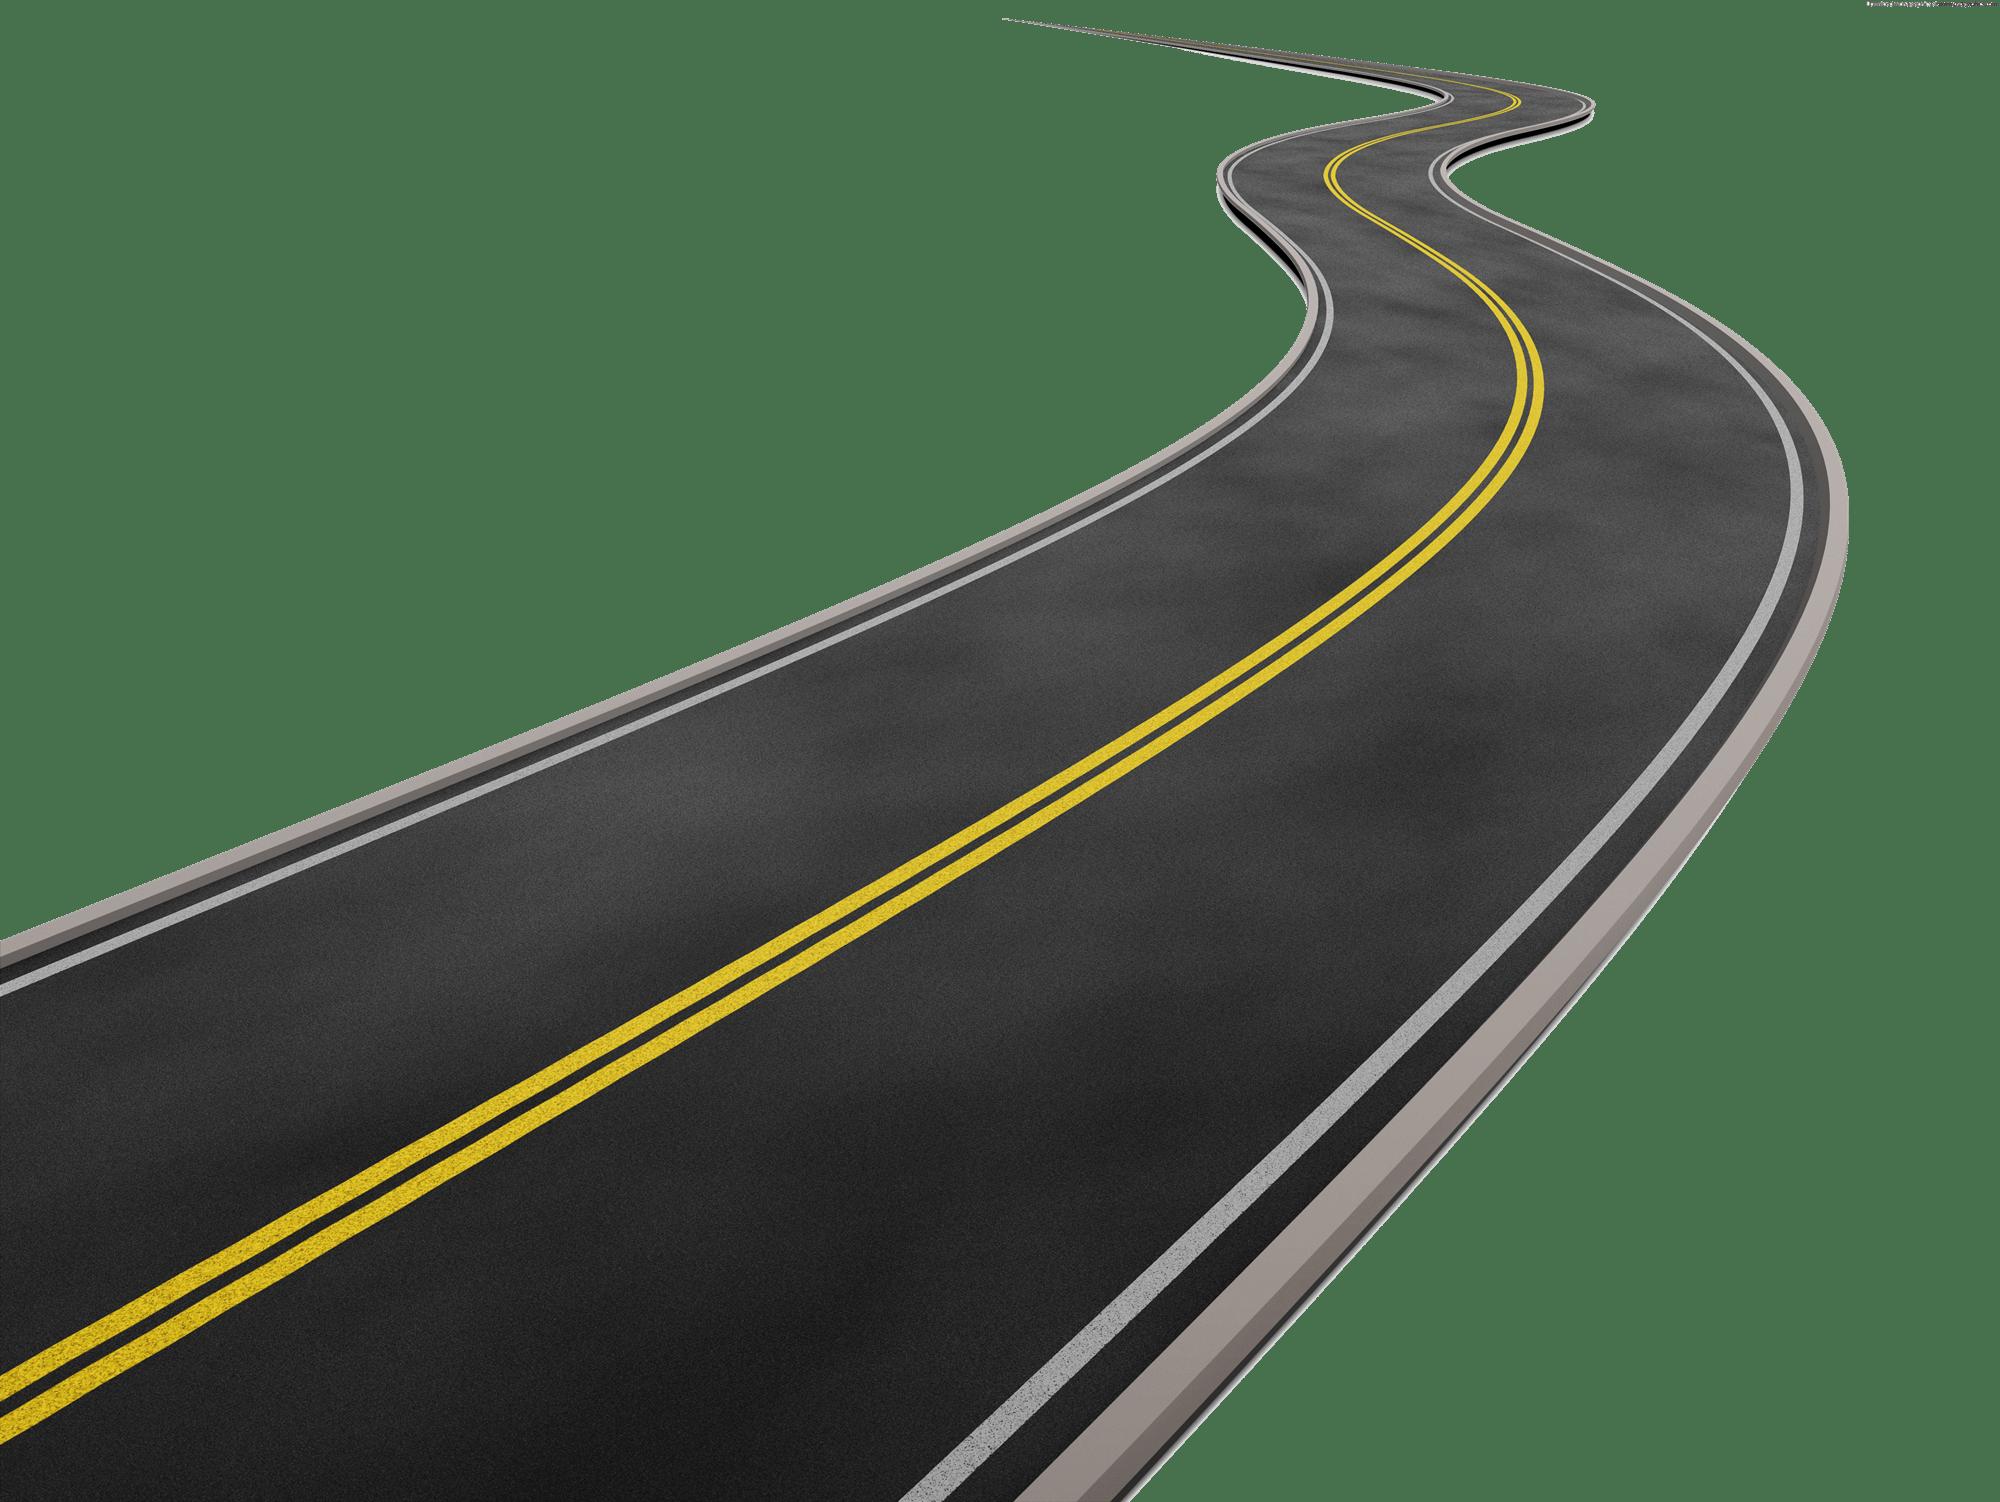 Road Background transparent PNG.